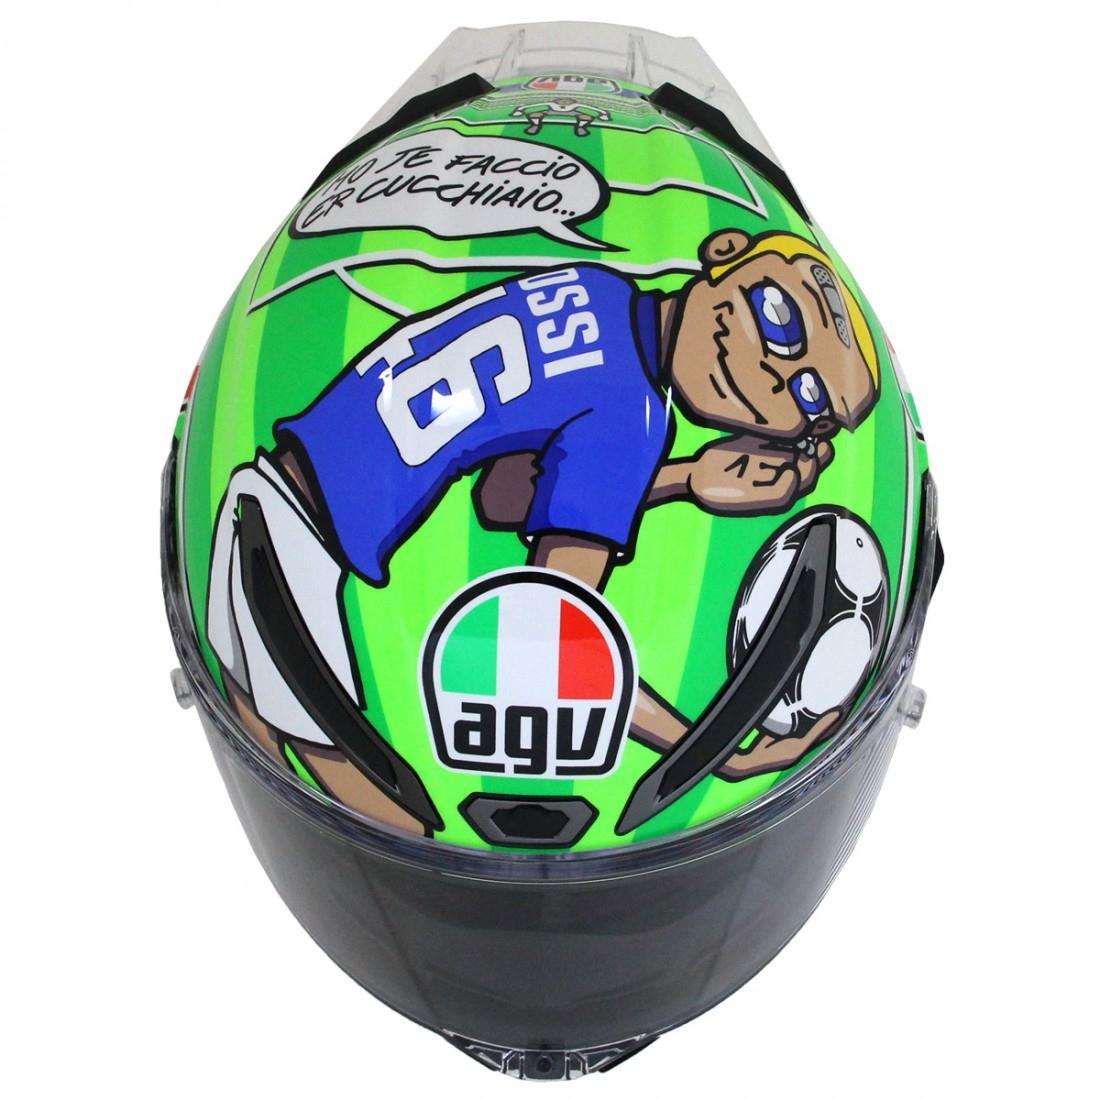 Helm AGV Pista GP R Rossi Mugello 2017 Limited Edition